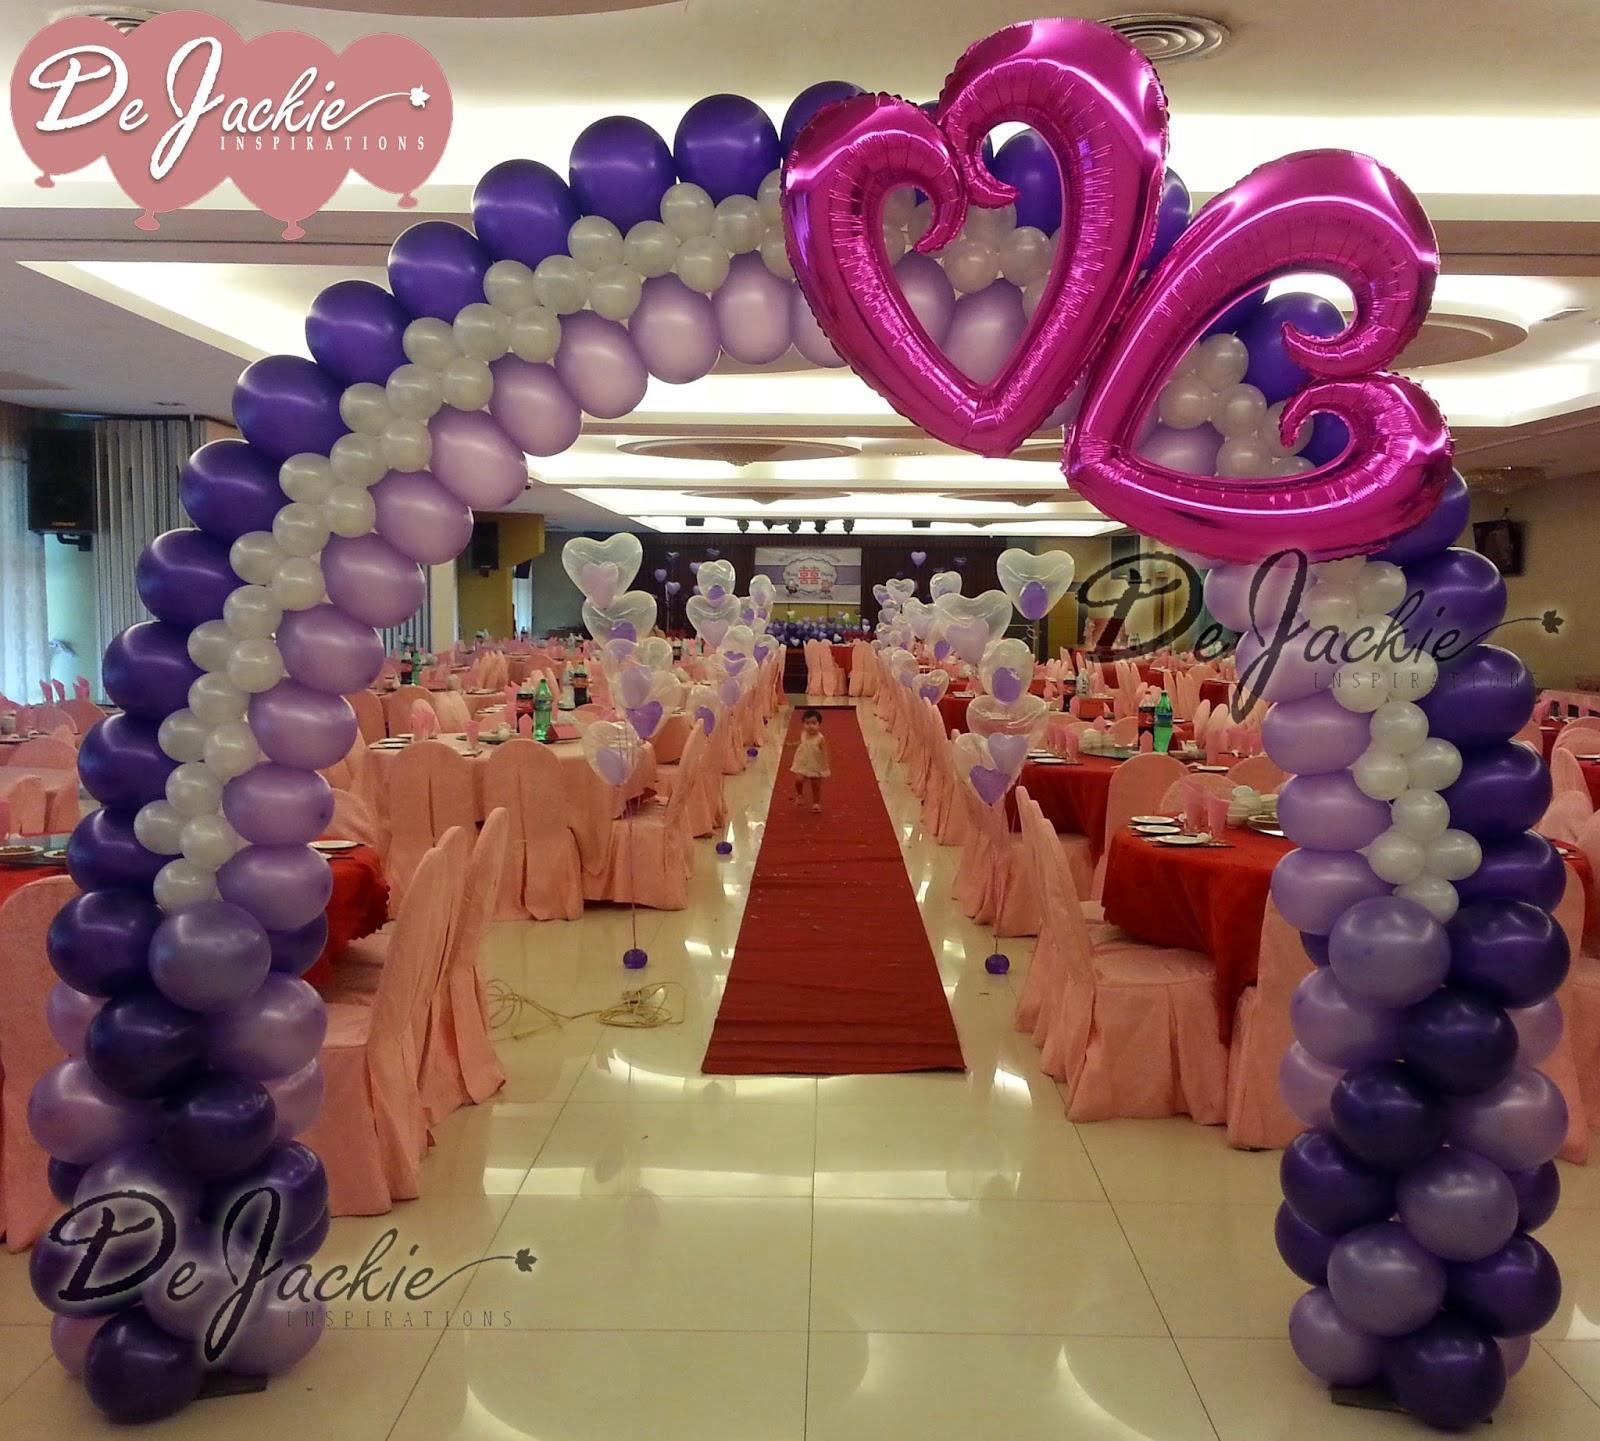 Balloon Wedding Decorations Ideas: Balloon Decorations For Weddings, Birthday Parties